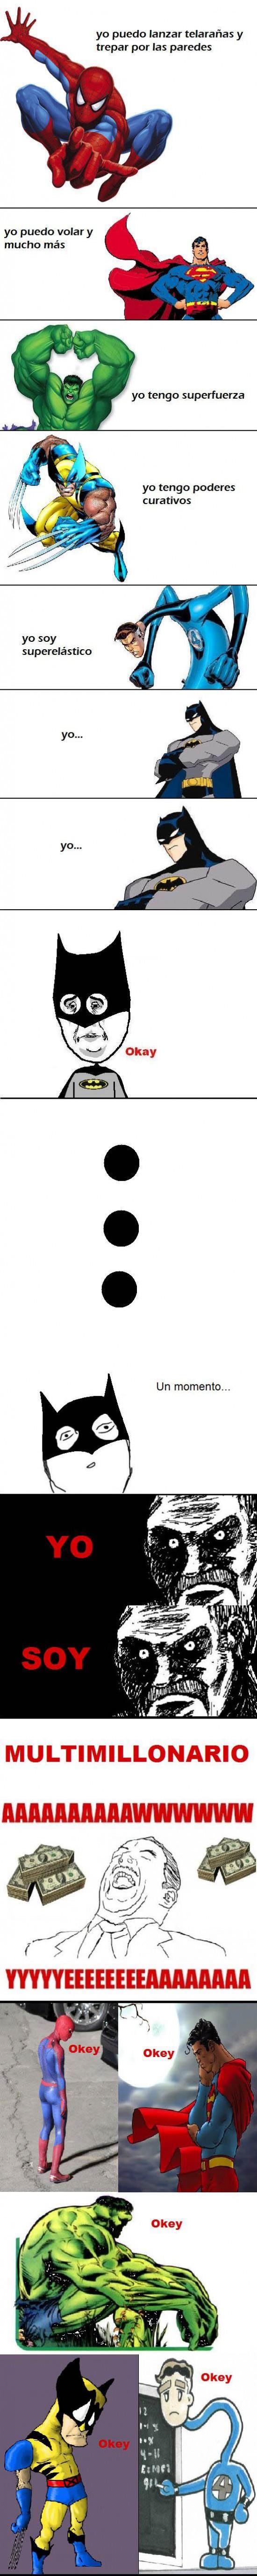 aww yea,batman,hulk,lobezno,mirada fija,okey,spiderman,sr.fantastico,superman